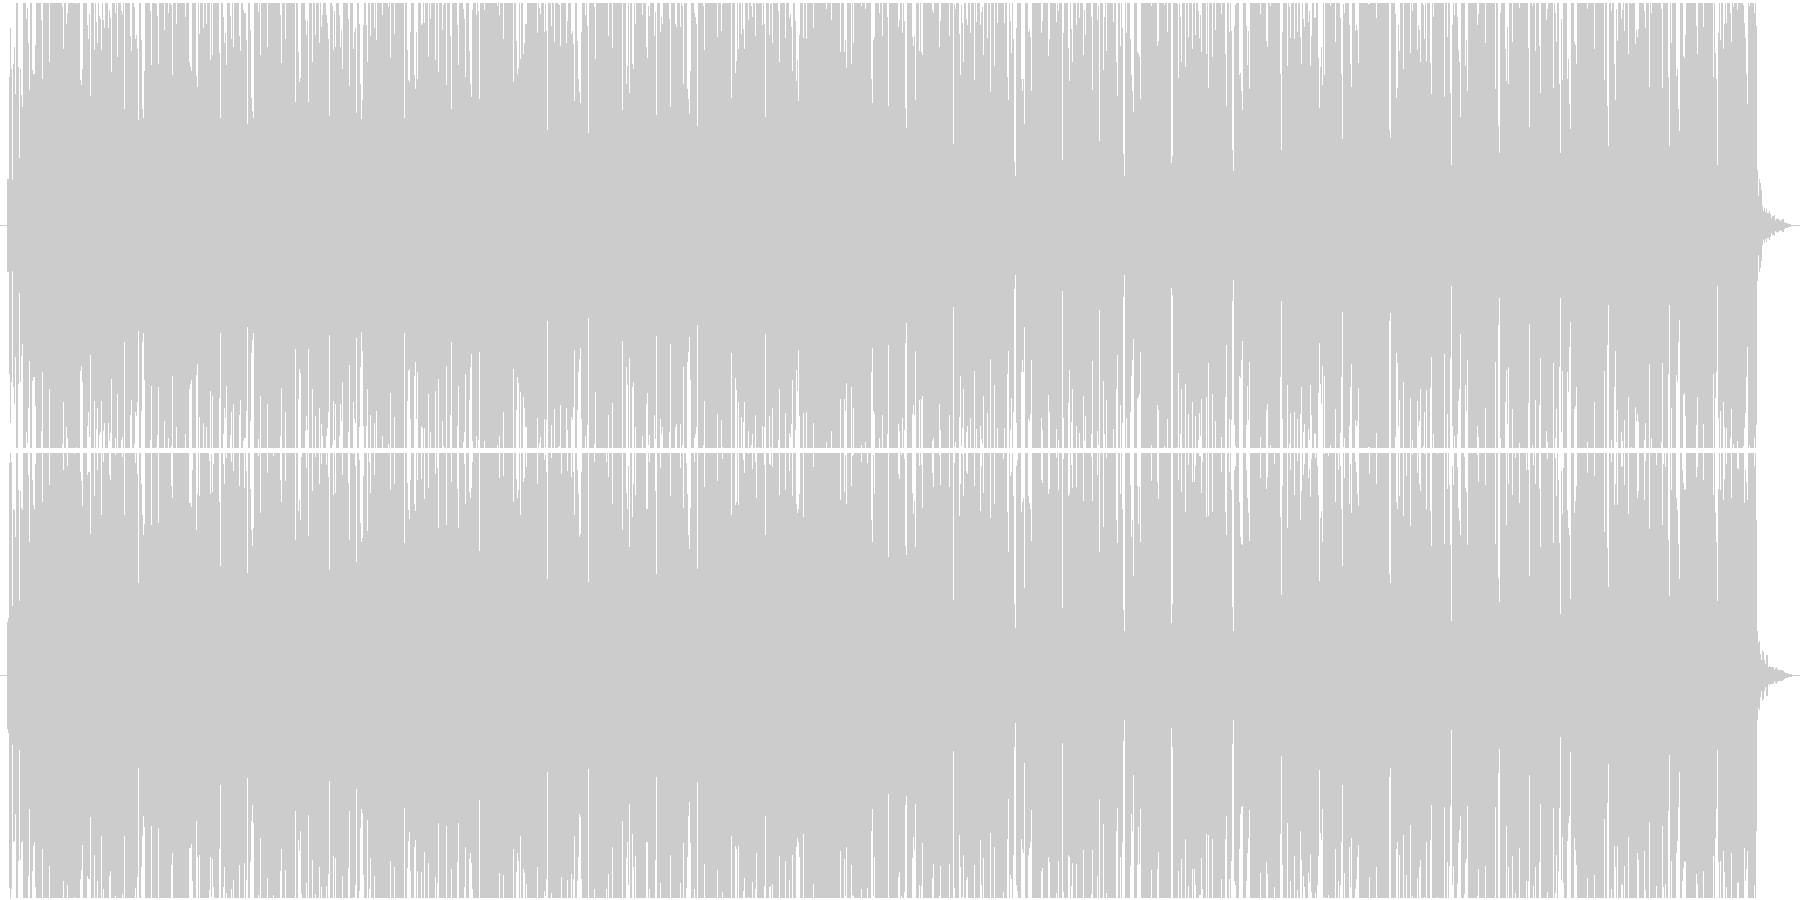 TikTokにありそうなパリピ系EDMの未再生の波形